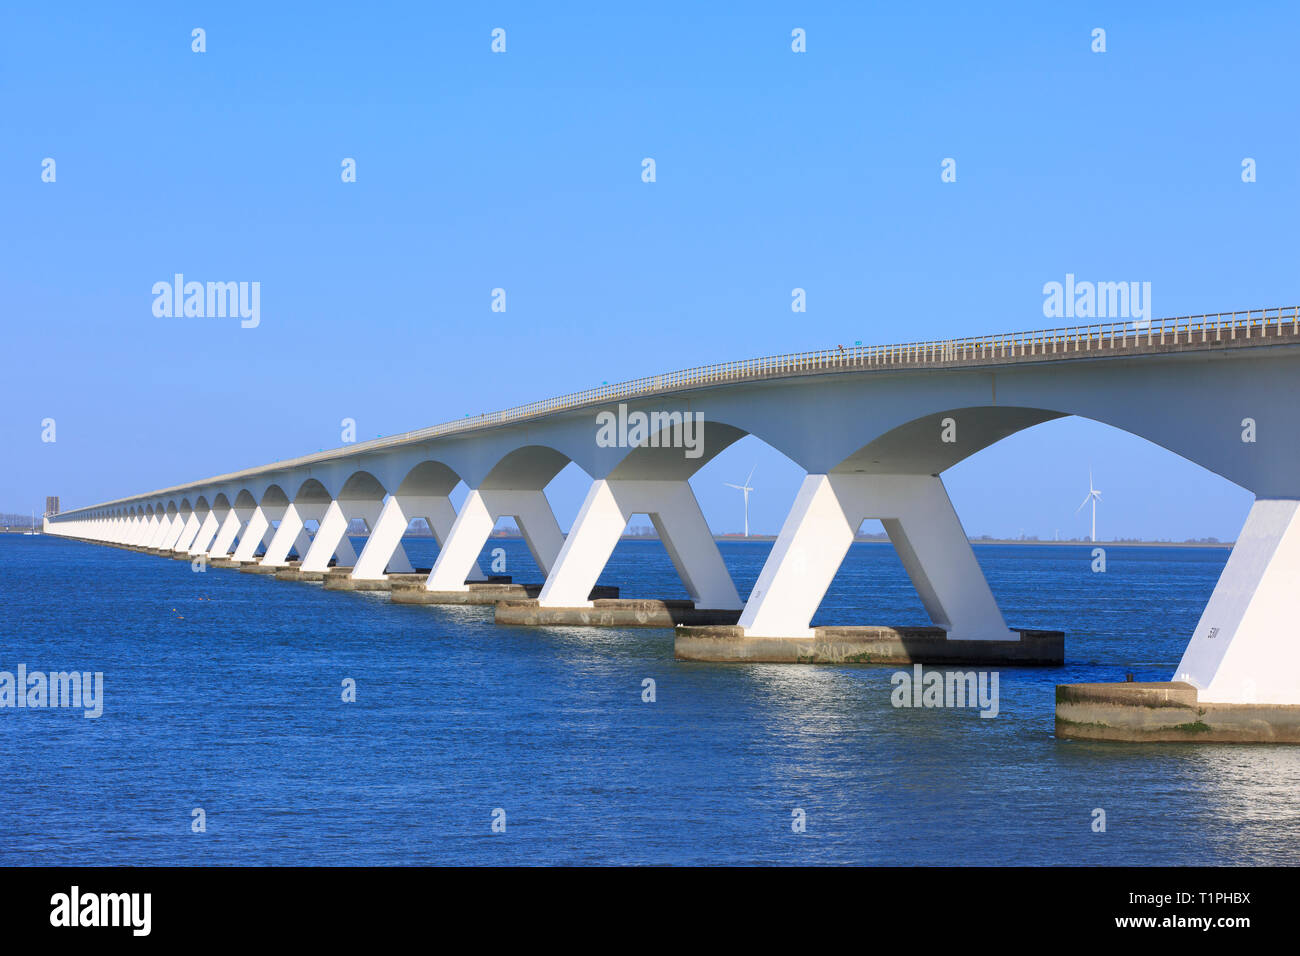 The 5,022 m (3.1 mi) long Zeeland Bridge (Zeelandbrug) near Colijnsplaat (Zeeland), Netherlands on a beautiful spring day - Stock Image